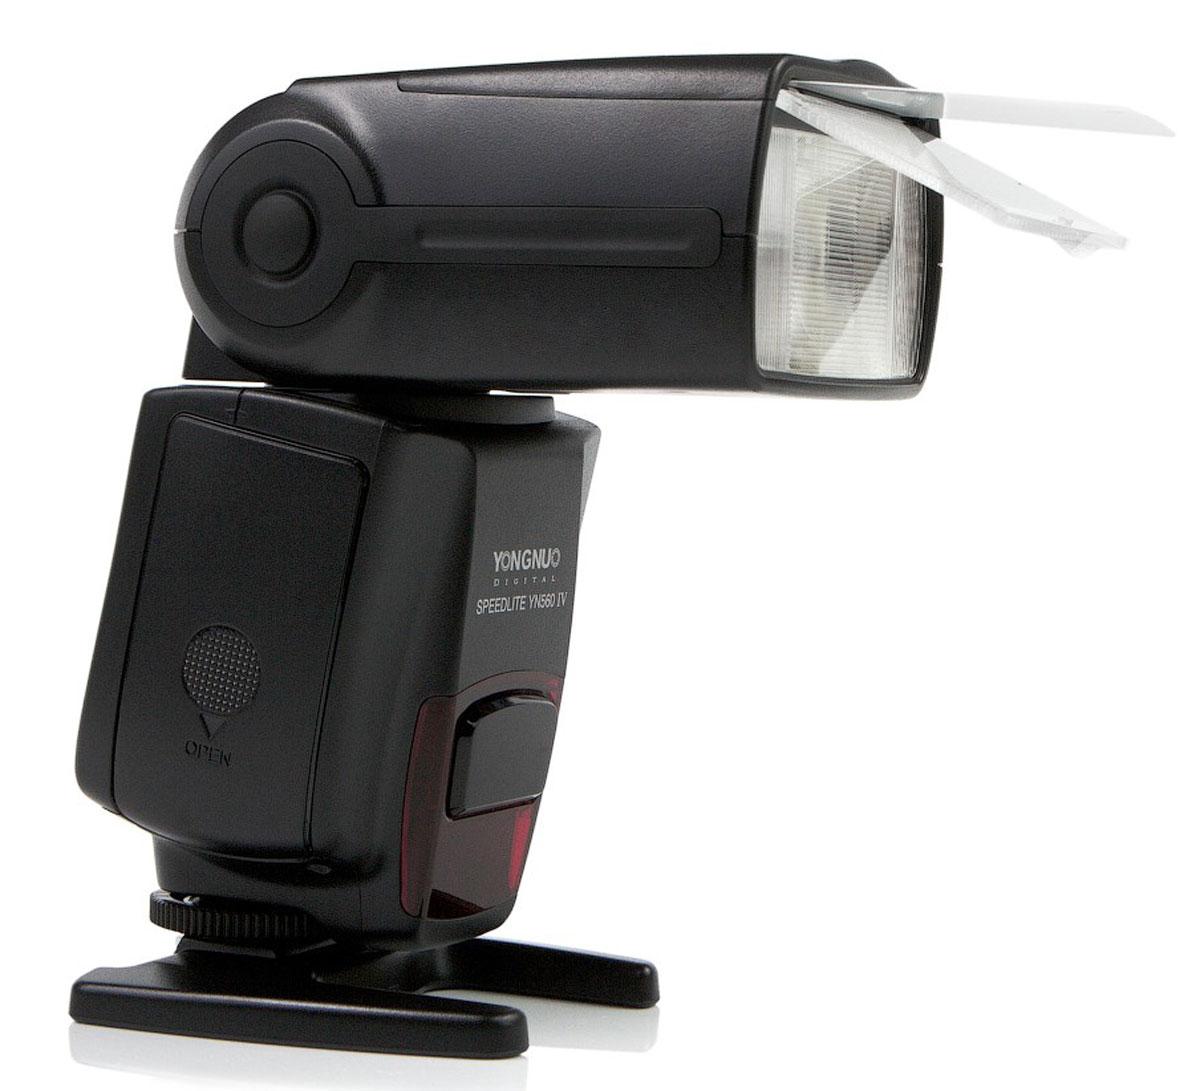 YongNuo Speedlite YN-560IV вспышка со встроенным радиосинхронизатором для Canon, Nikon, Pentax, Olympus, Sony